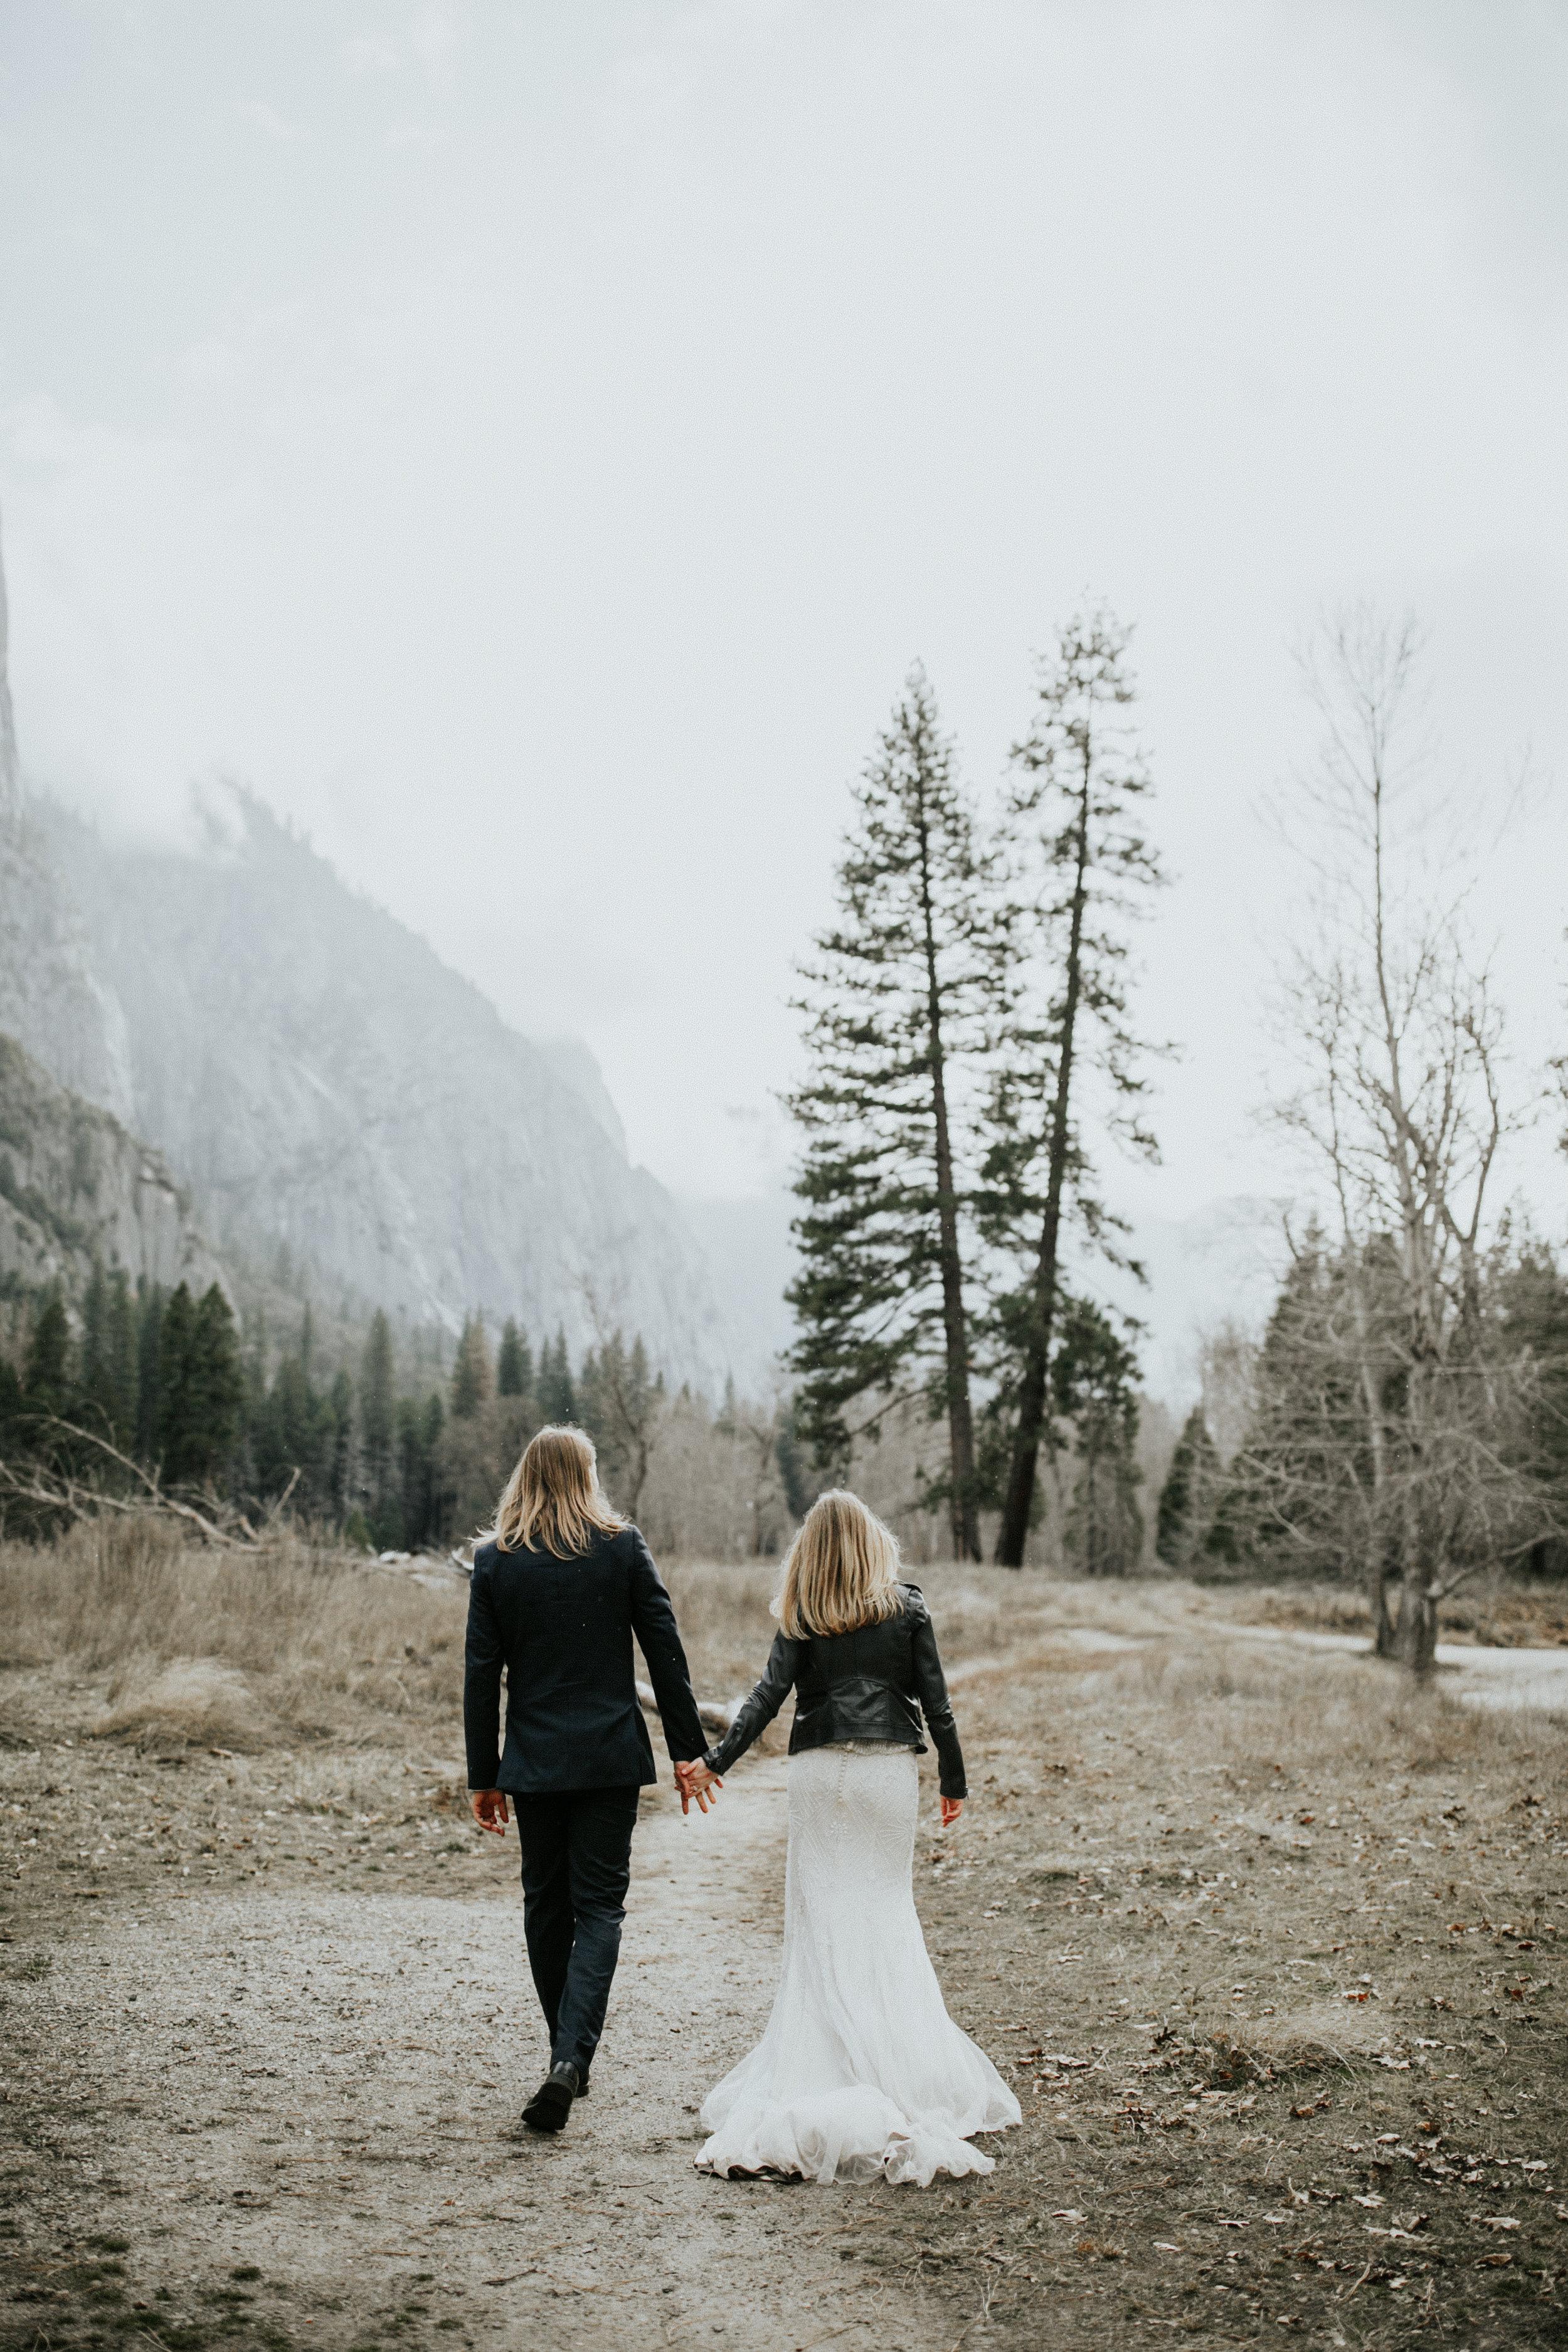 adventure-california-yosemite-photographer-grace-t-photography-75.jpg